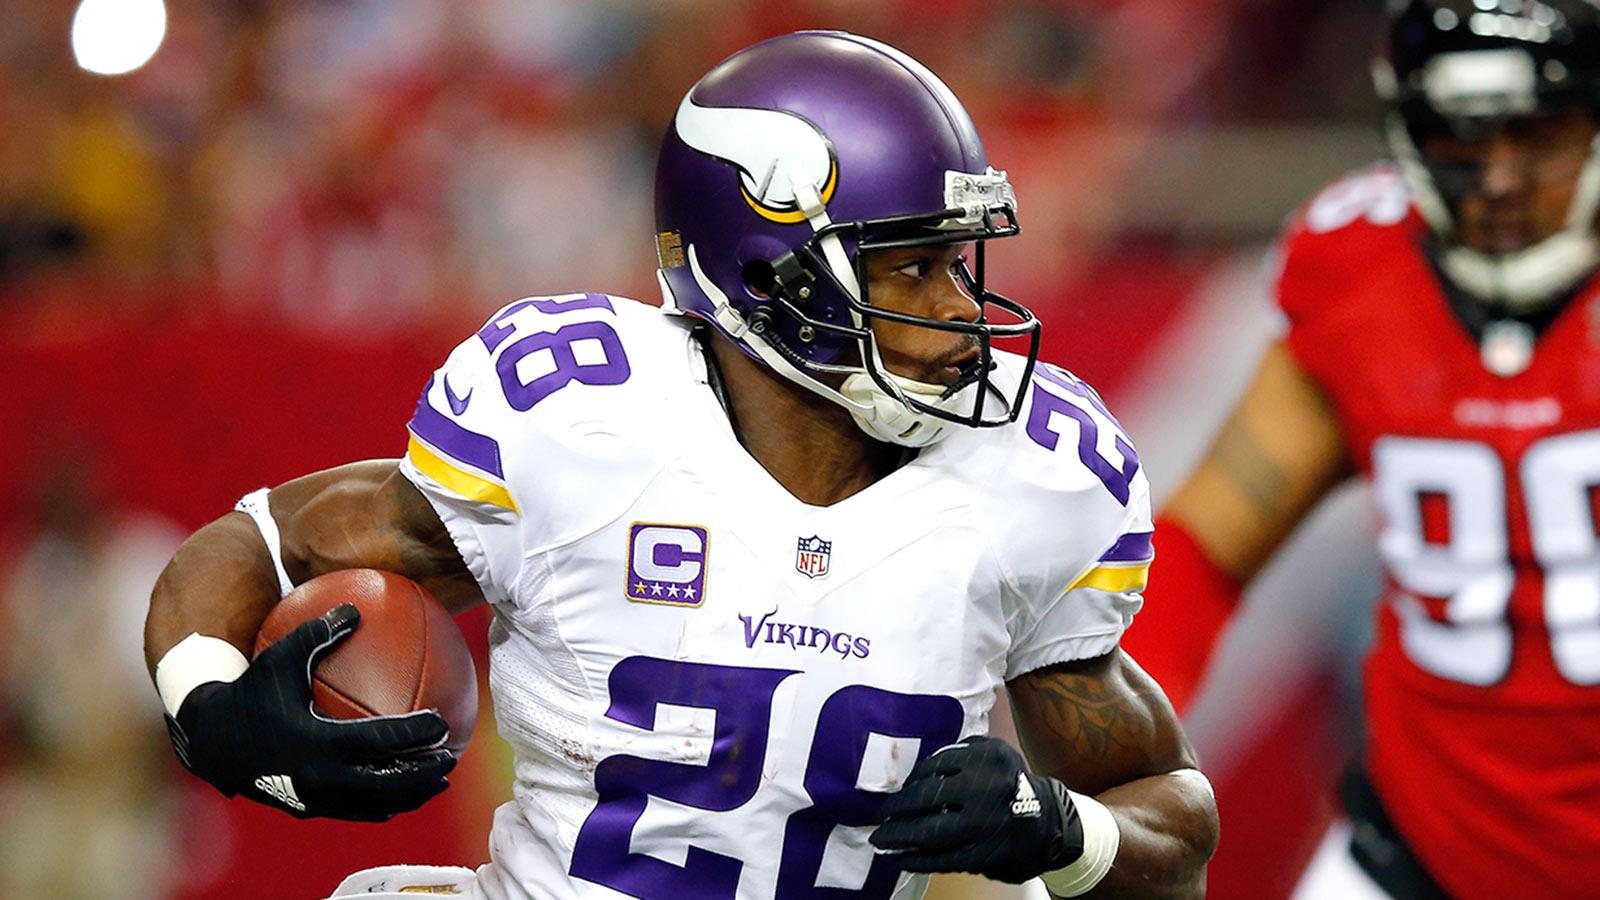 WhatIfSports NFL Week 13 predictions: Vikings over Seahawks